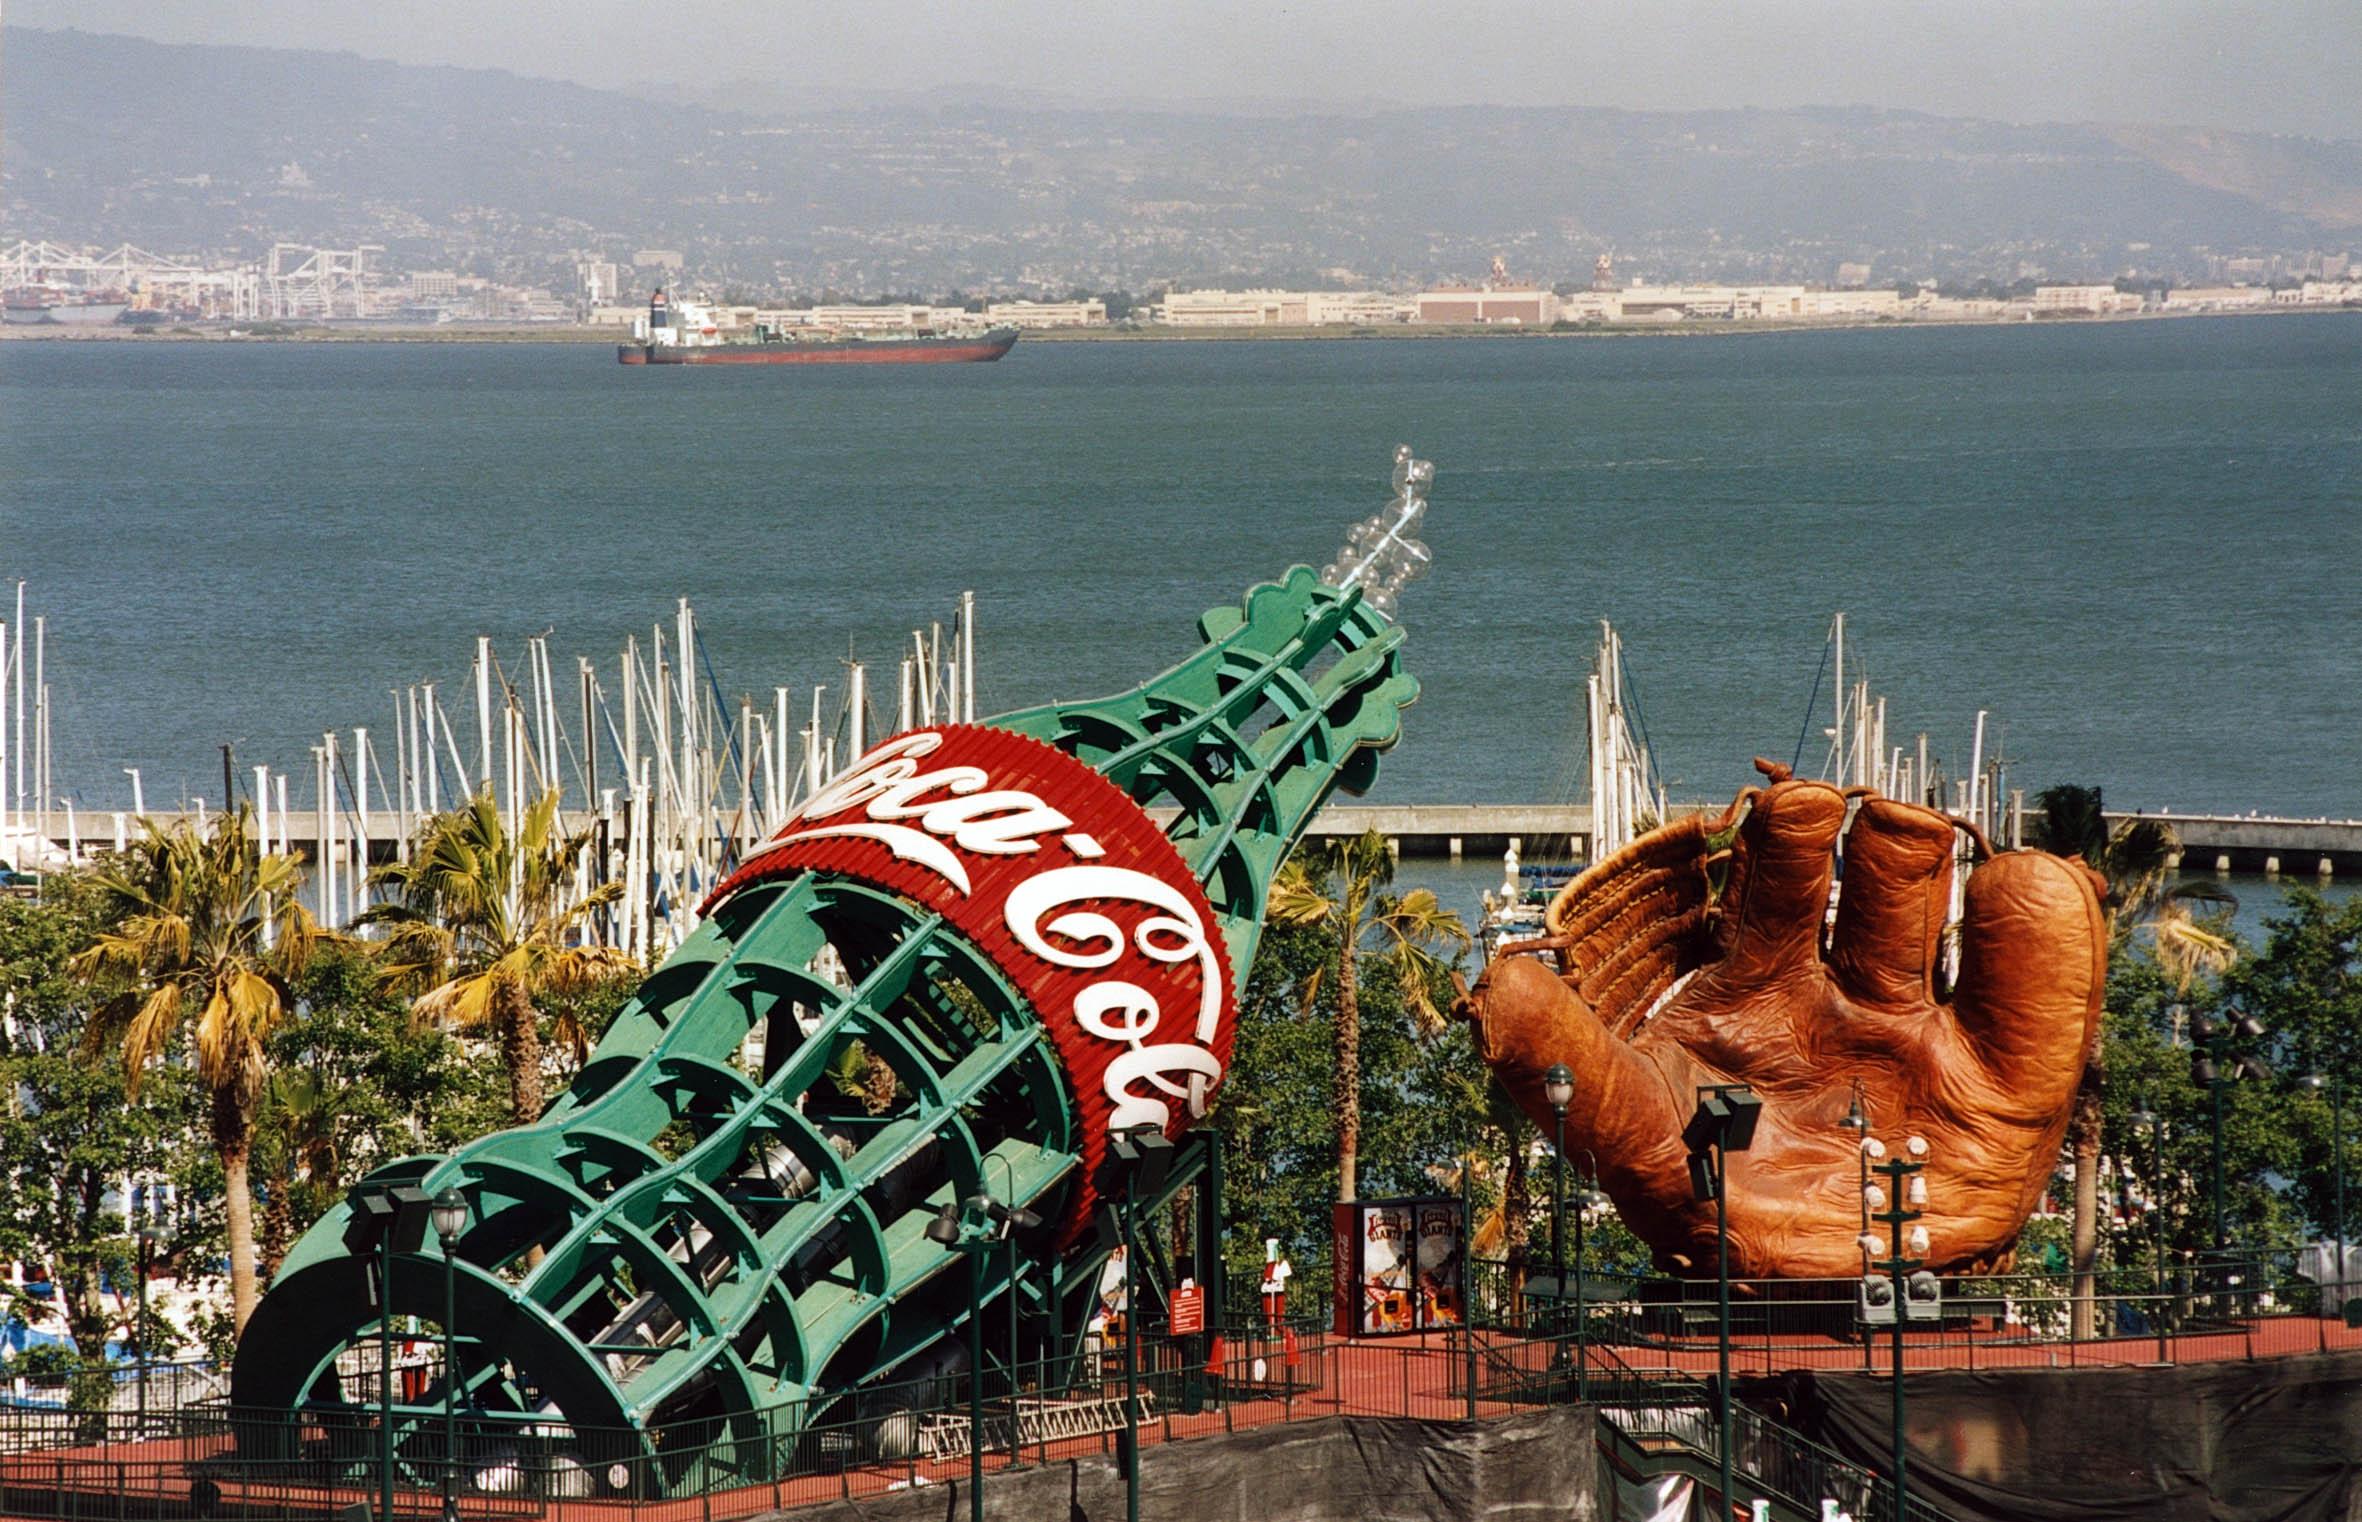 San Francisco Giants - Giant Baseball Mitt and Coca-Cola Bottle - World's Largest Baseball Glove